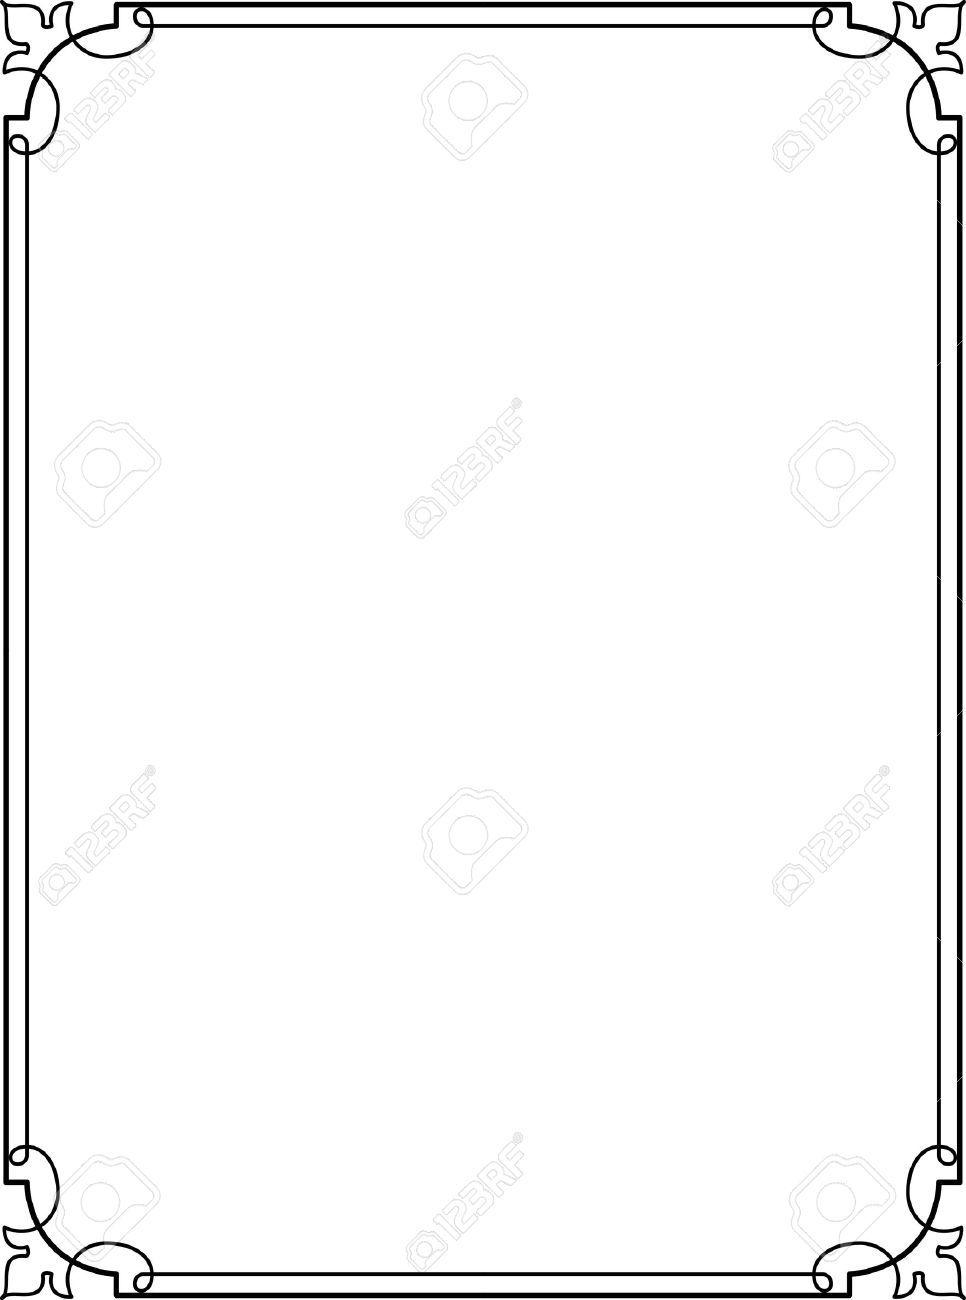 simple lines border frame vector design royalty free